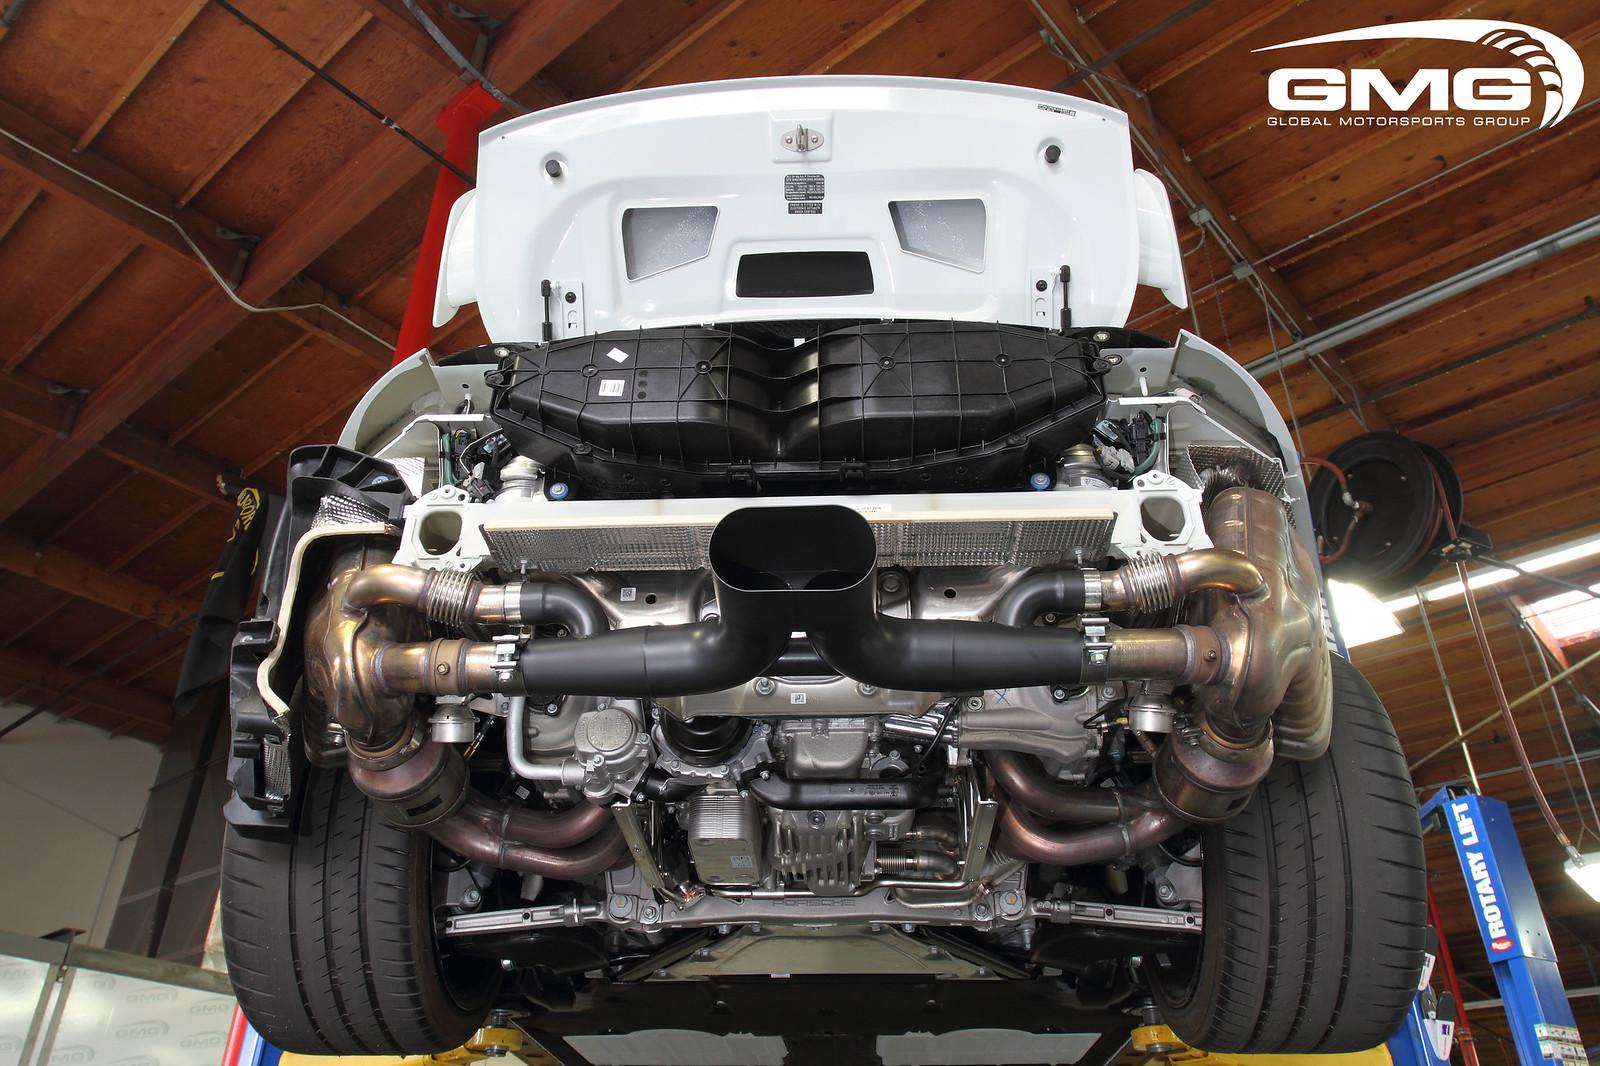 Gmg Racing Porsche 991 Gt3 Exhaust Center Section Now